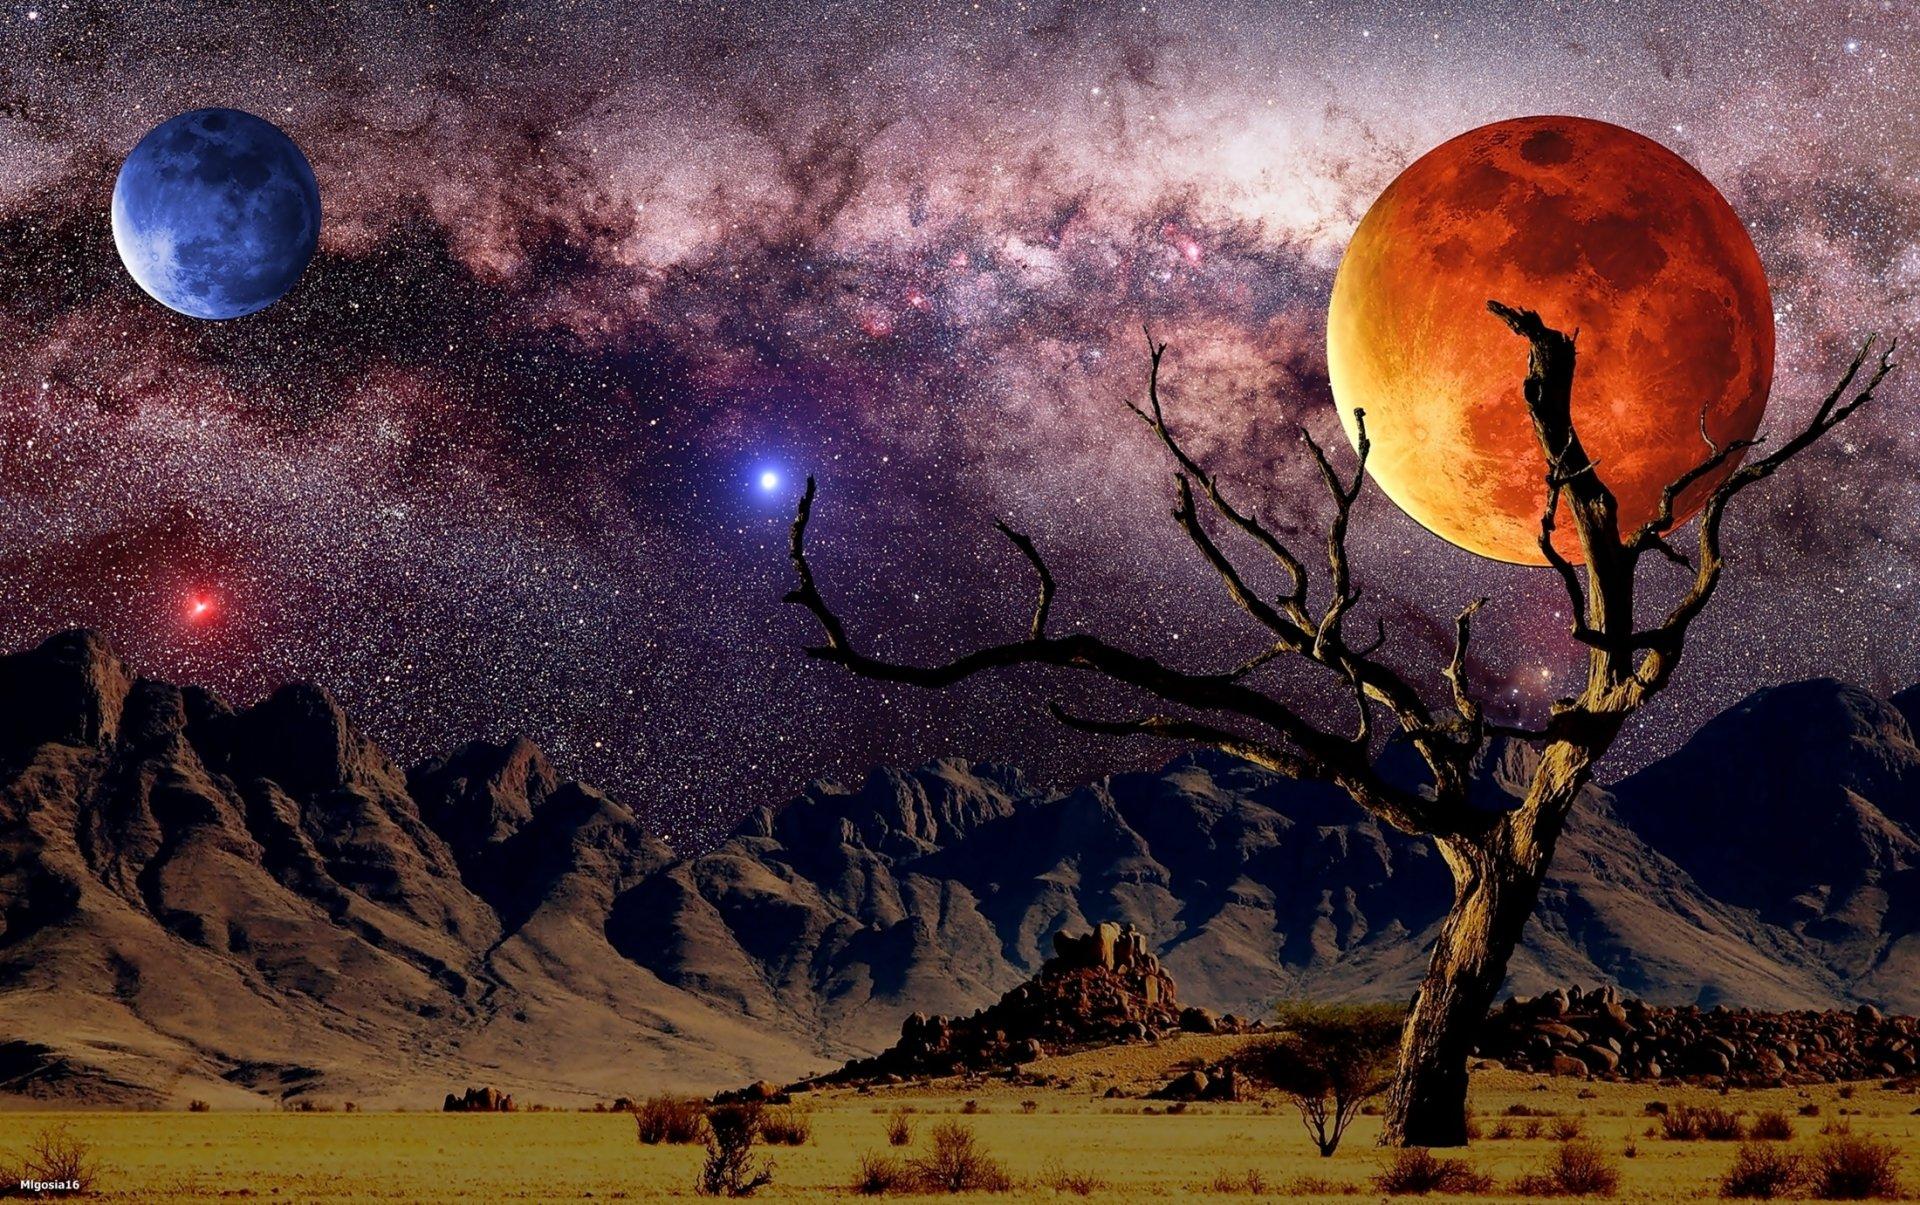 68 fondos de pantalla de paisajes de fantas a bonitos for Paesaggi fantasy immagini